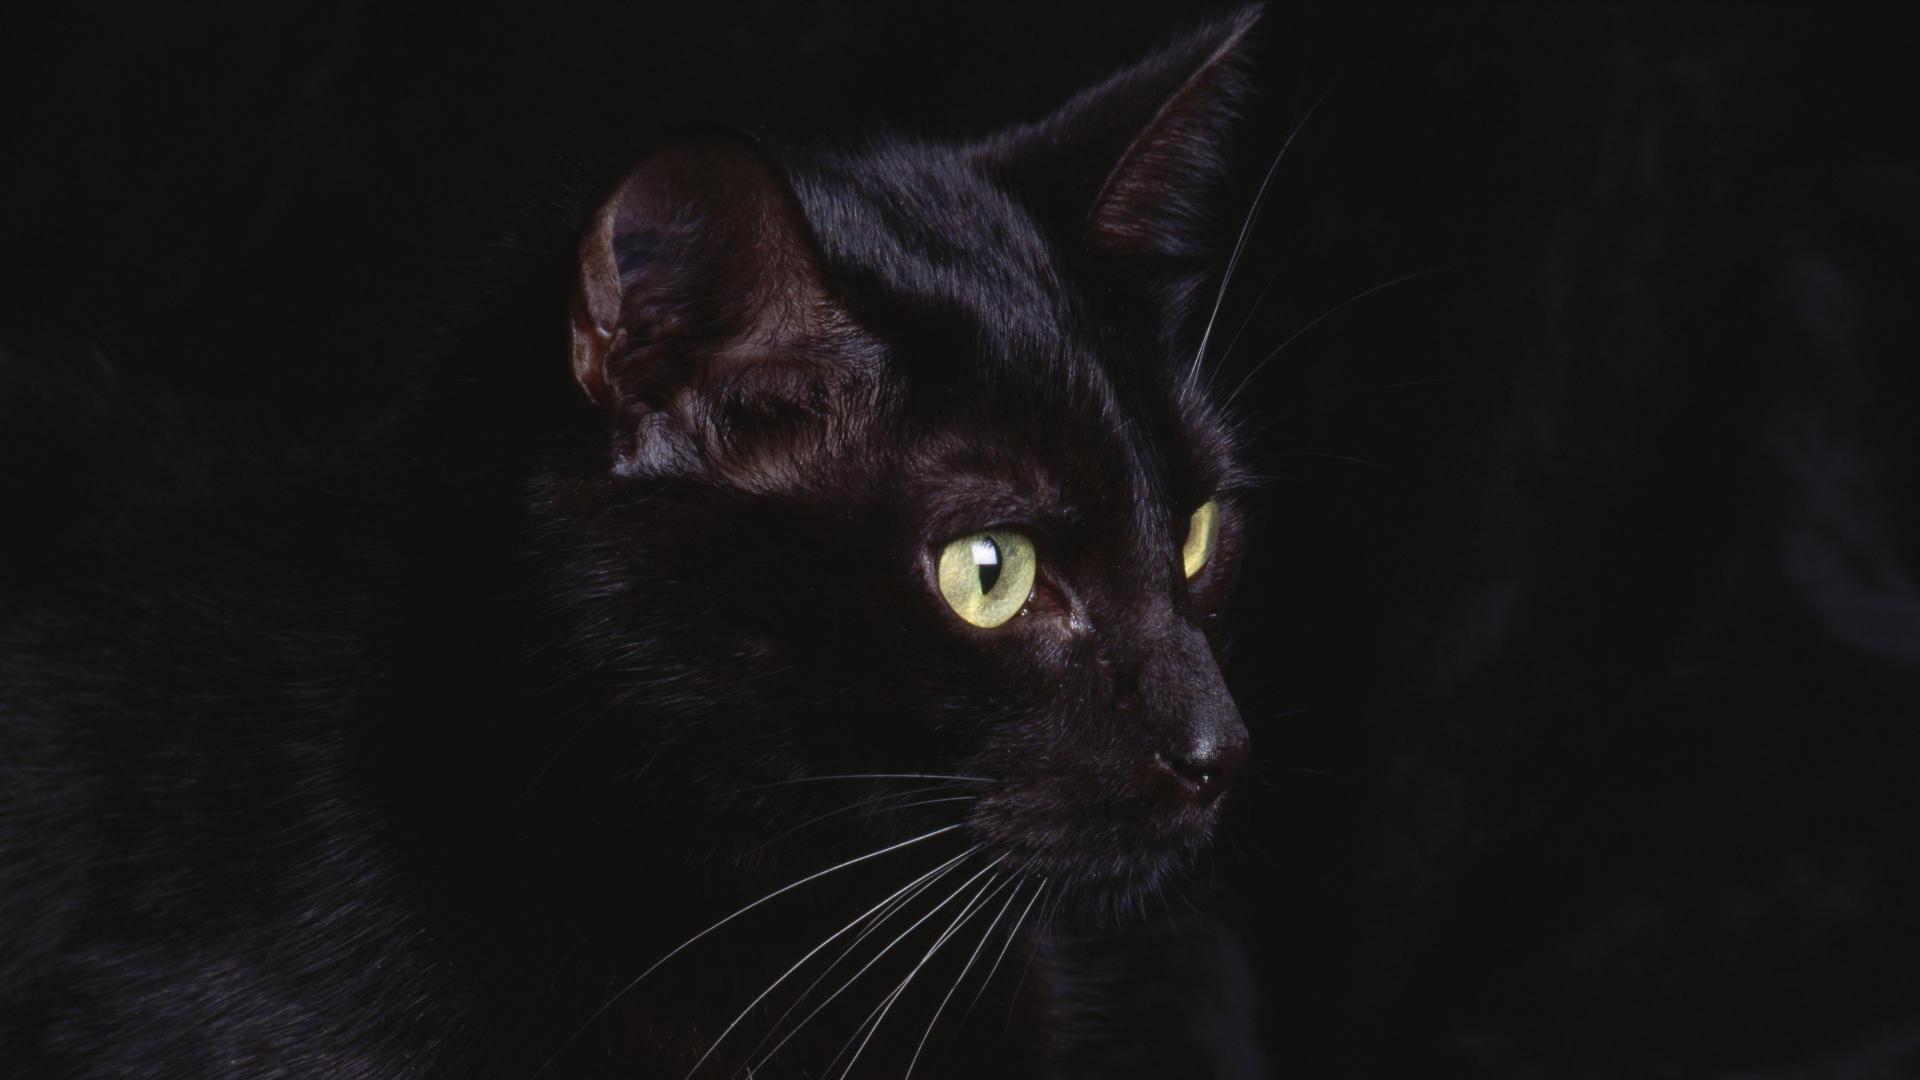 Black Cat Animal Wallpaper Download 7191 Wallpaper High Resolution 1920x1080